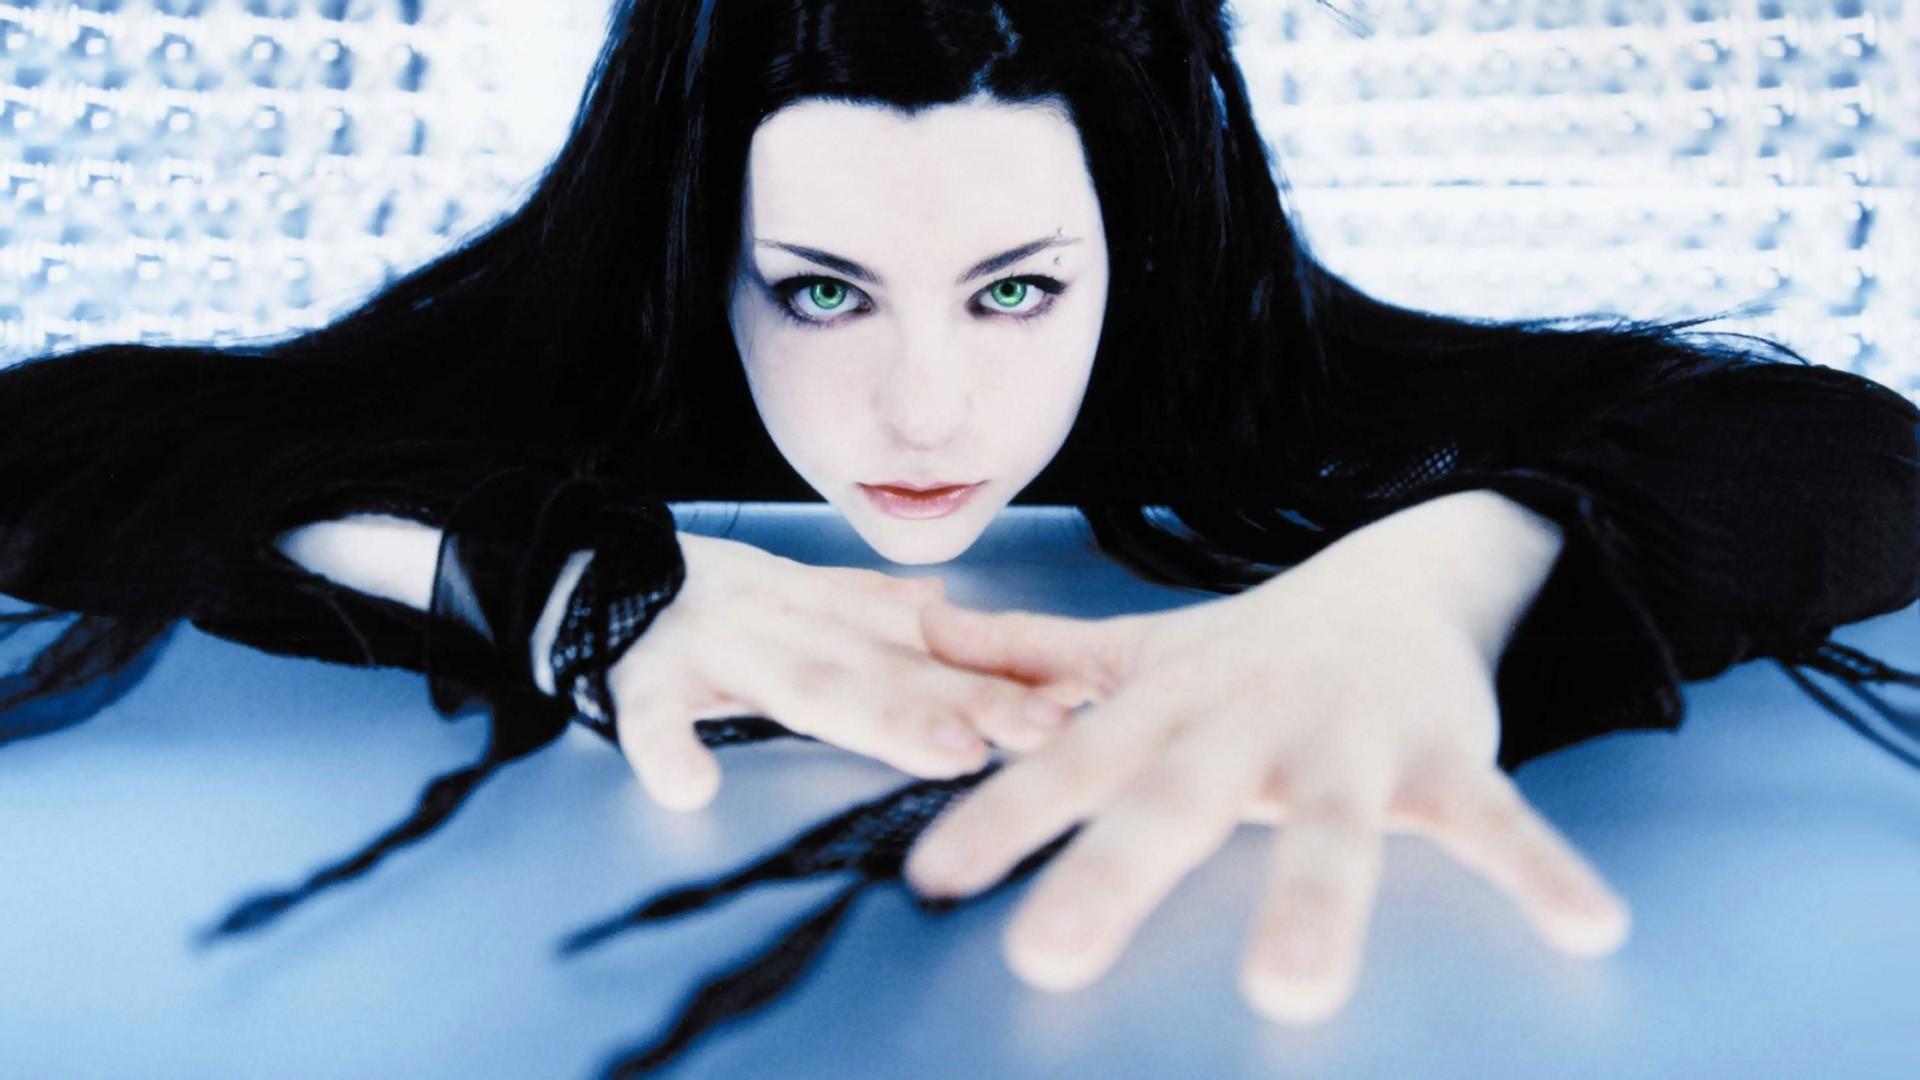 Music – Evanescence Wallpaper